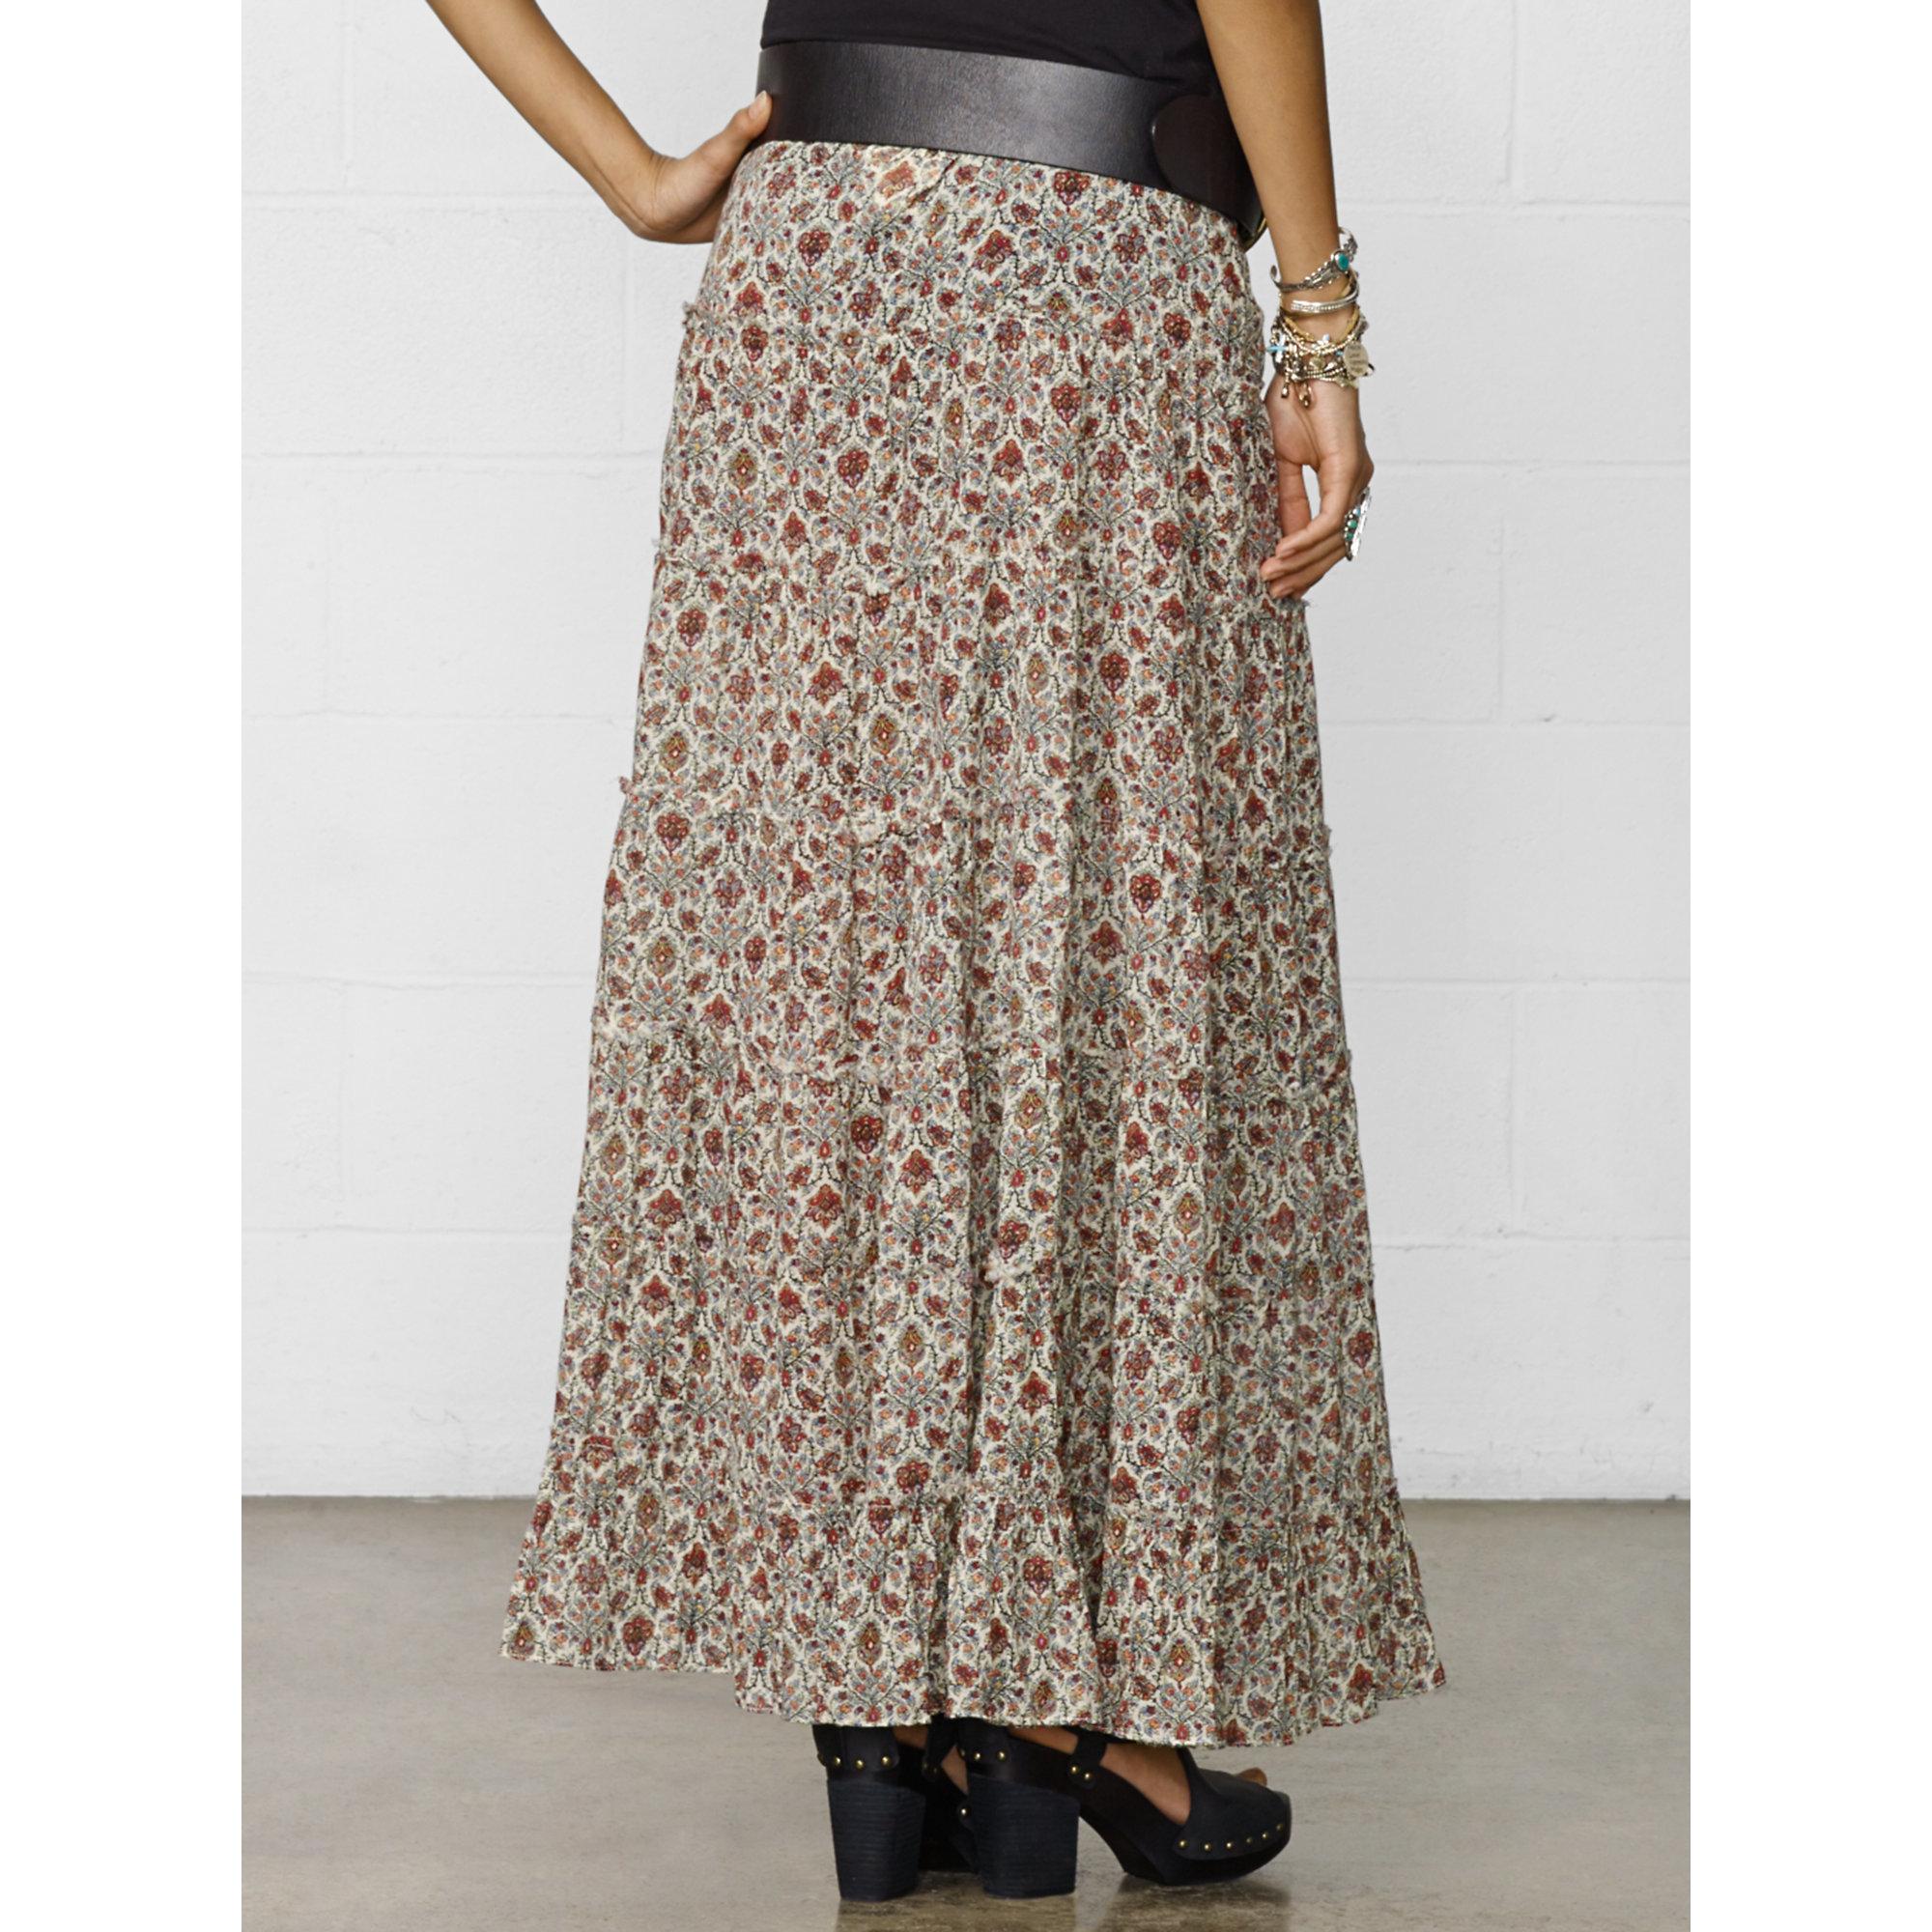 f4116fb878 Denim & Supply Ralph Lauren Lyon Paisley Tiered Maxiskirt - Lyst